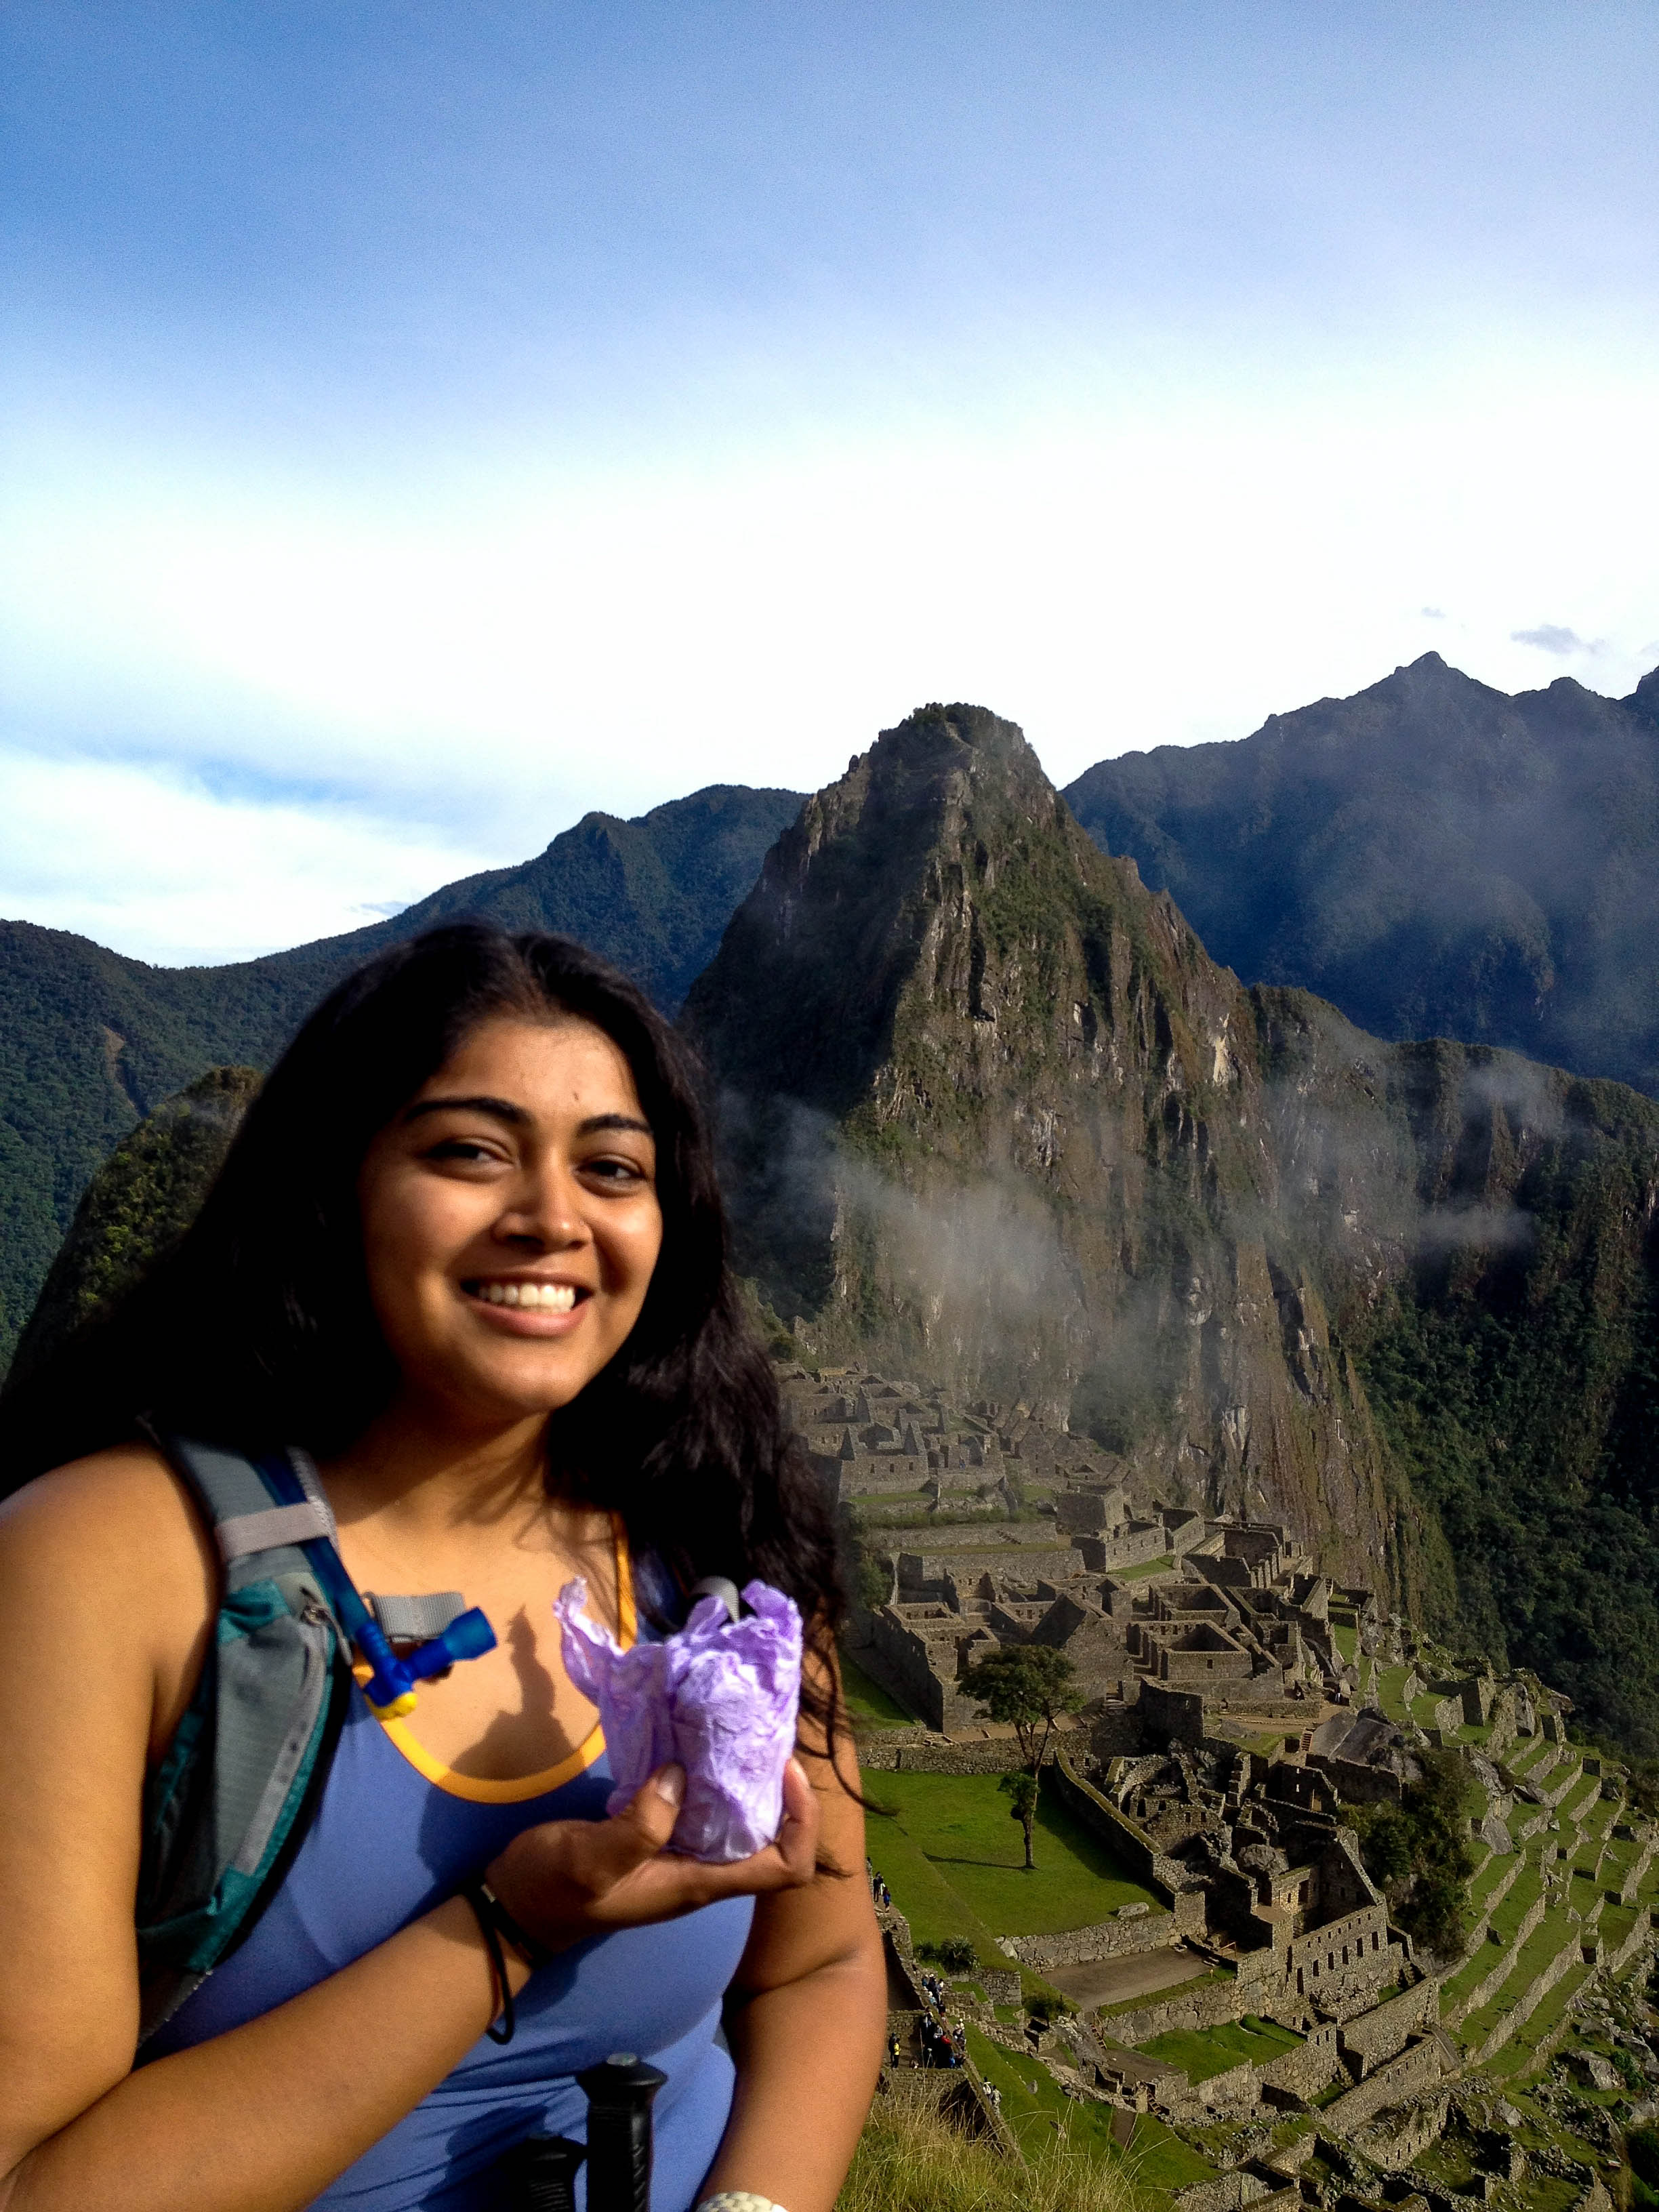 We made it to Machu Picchu